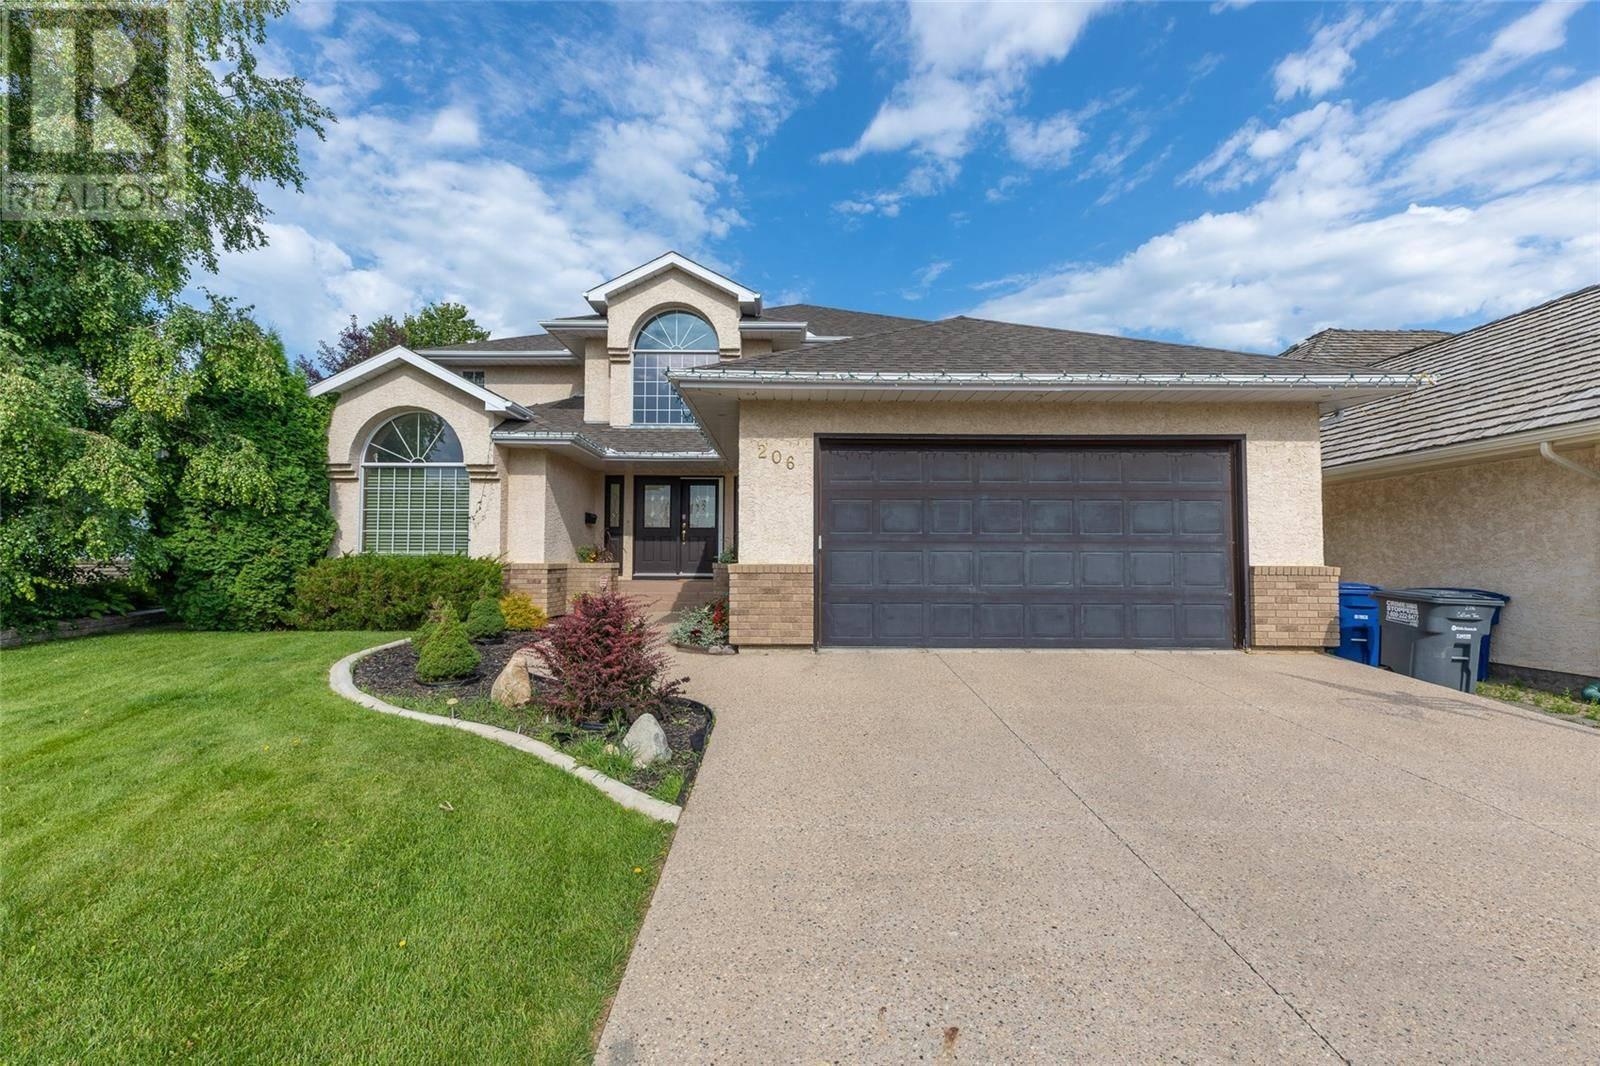 House for sale at 206 Collins Ter  Saskatoon Saskatchewan - MLS: SK789343